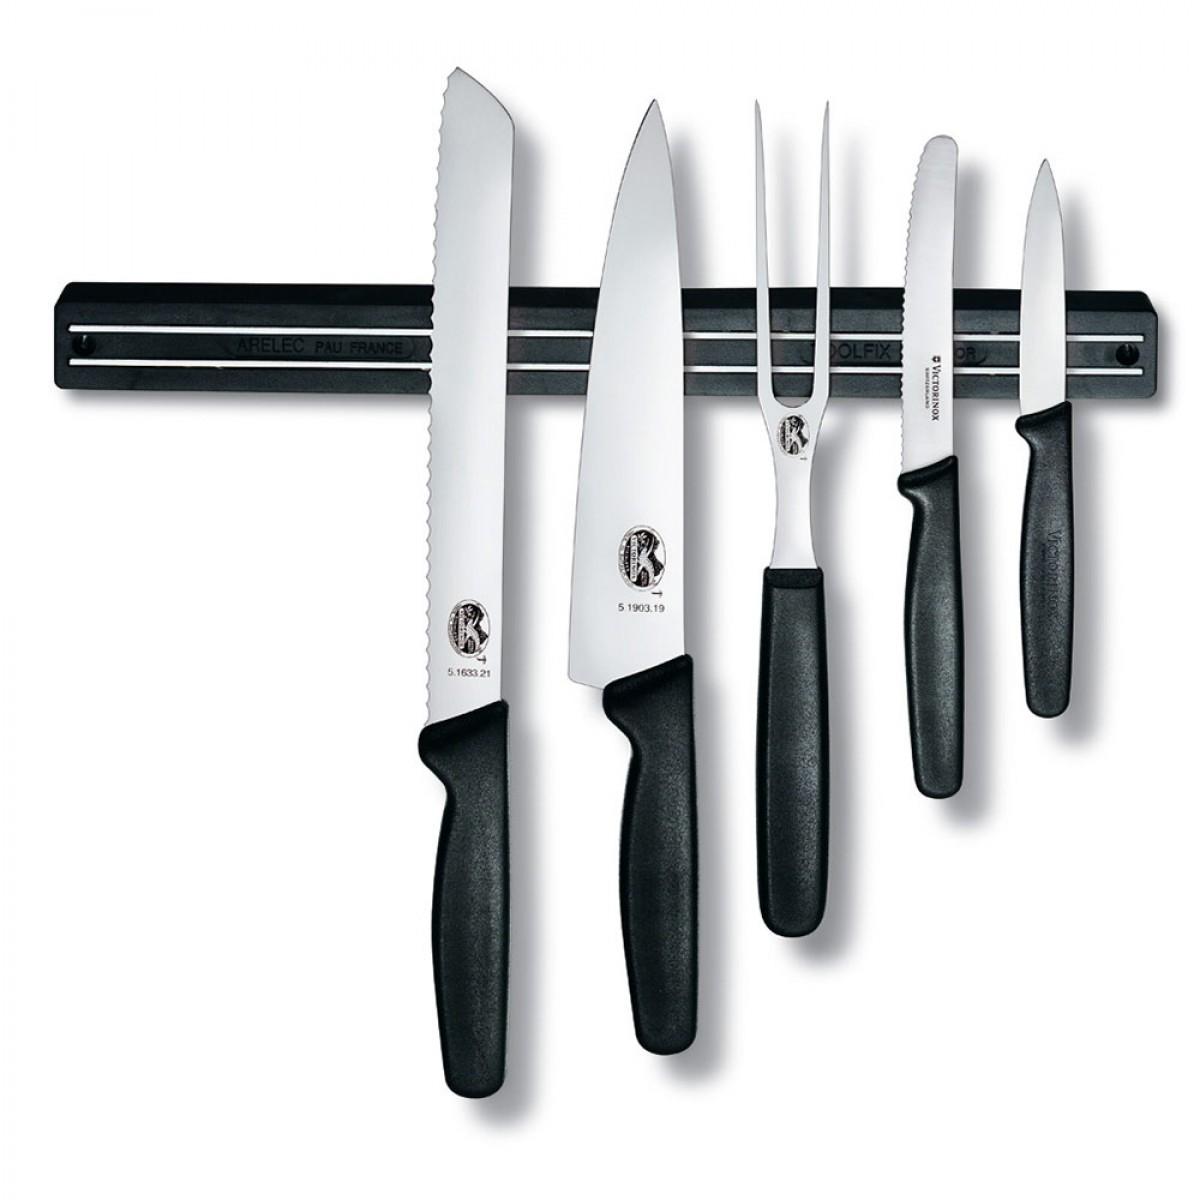 Barra magn tica para cuchillos major 35 cm de largo 3 - Barra magnetica cuchillos ...